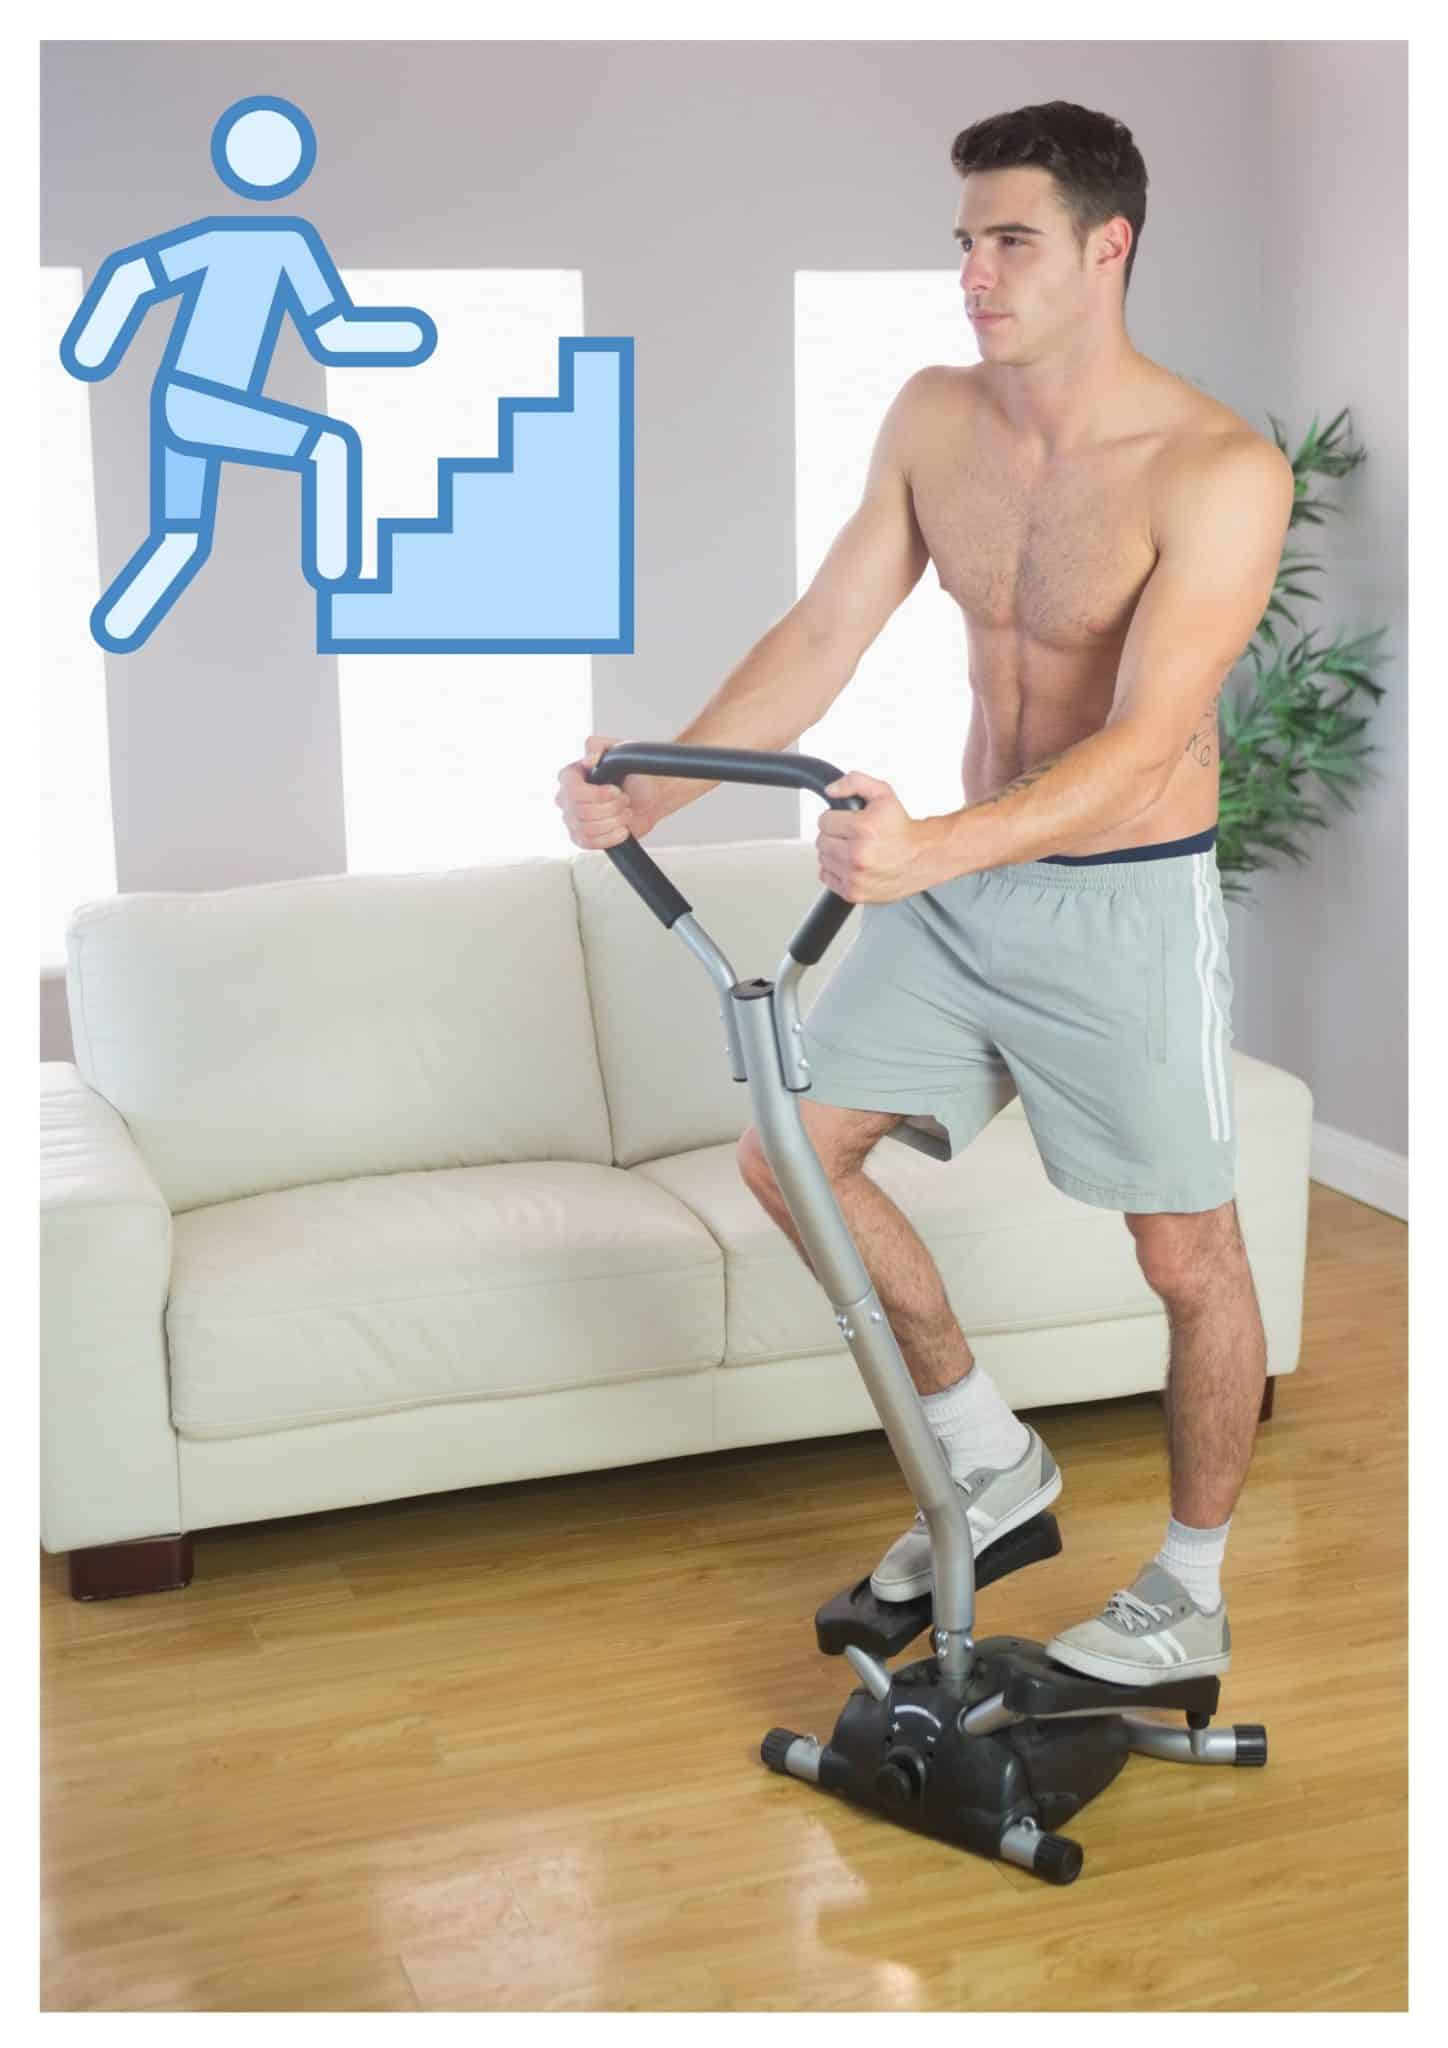 elliptical vs stair climber